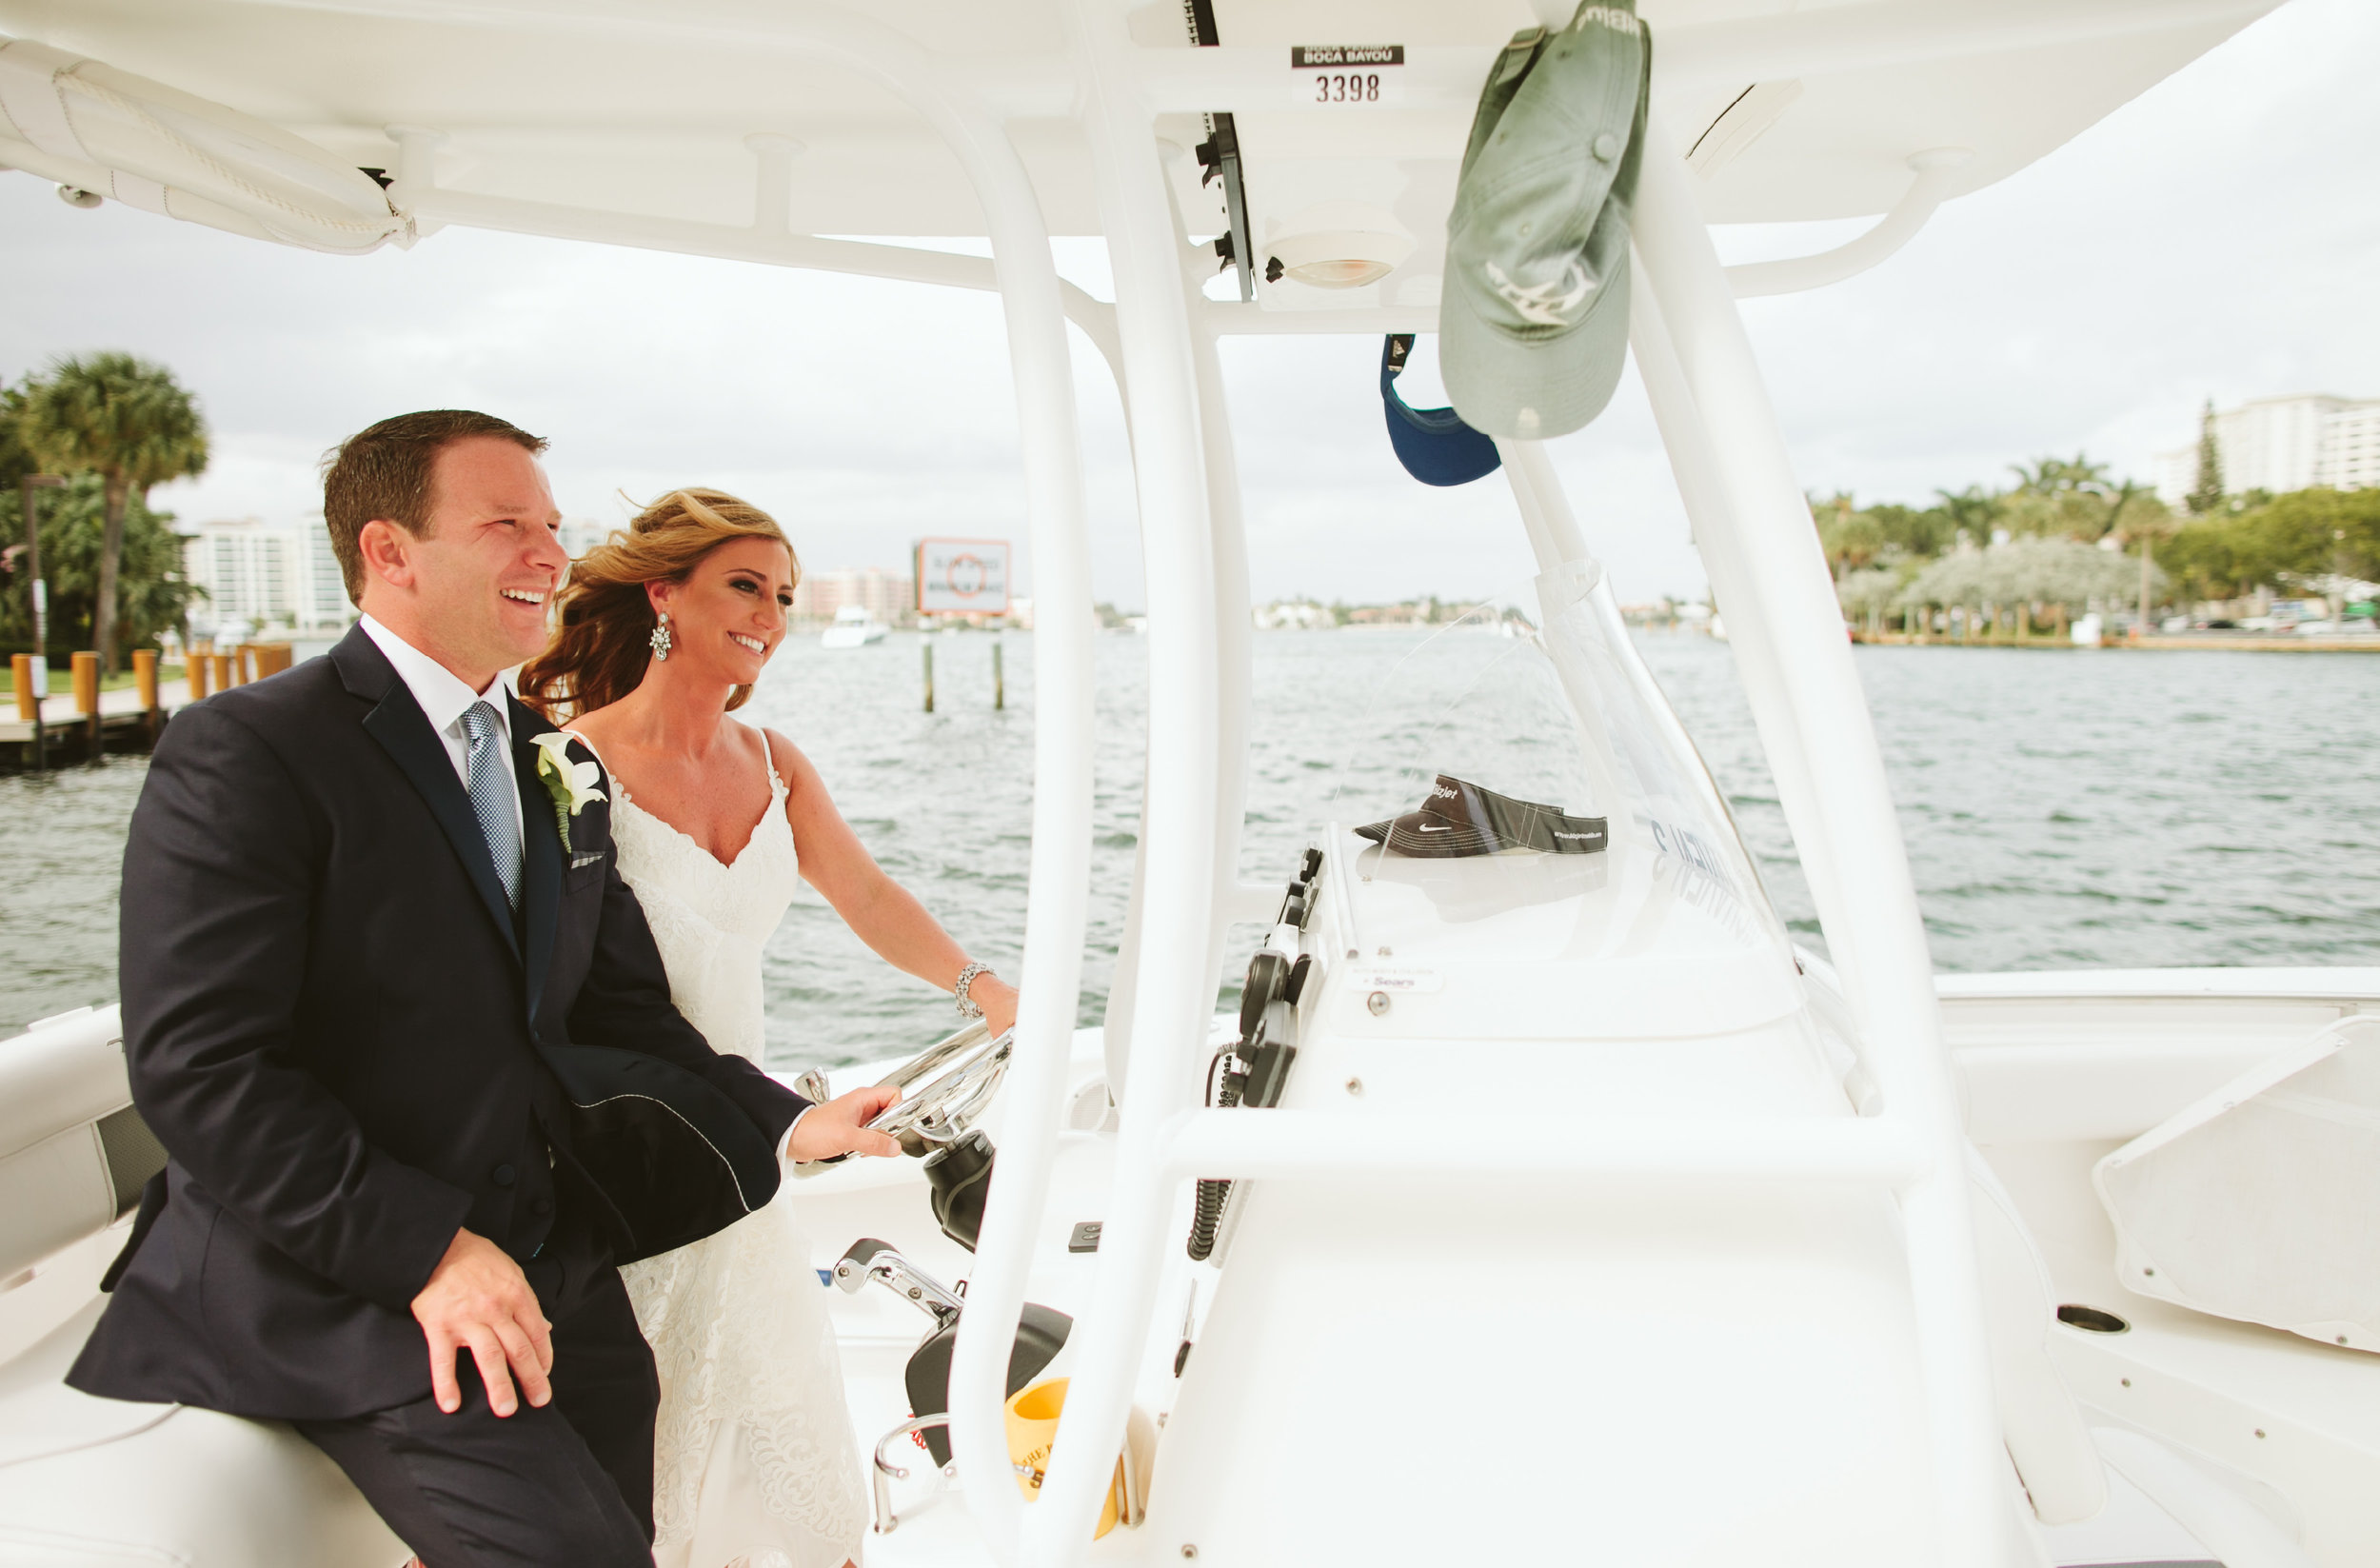 Kim + John's Wedding at the Waterstone Hotel in Boca Raton25.jpg